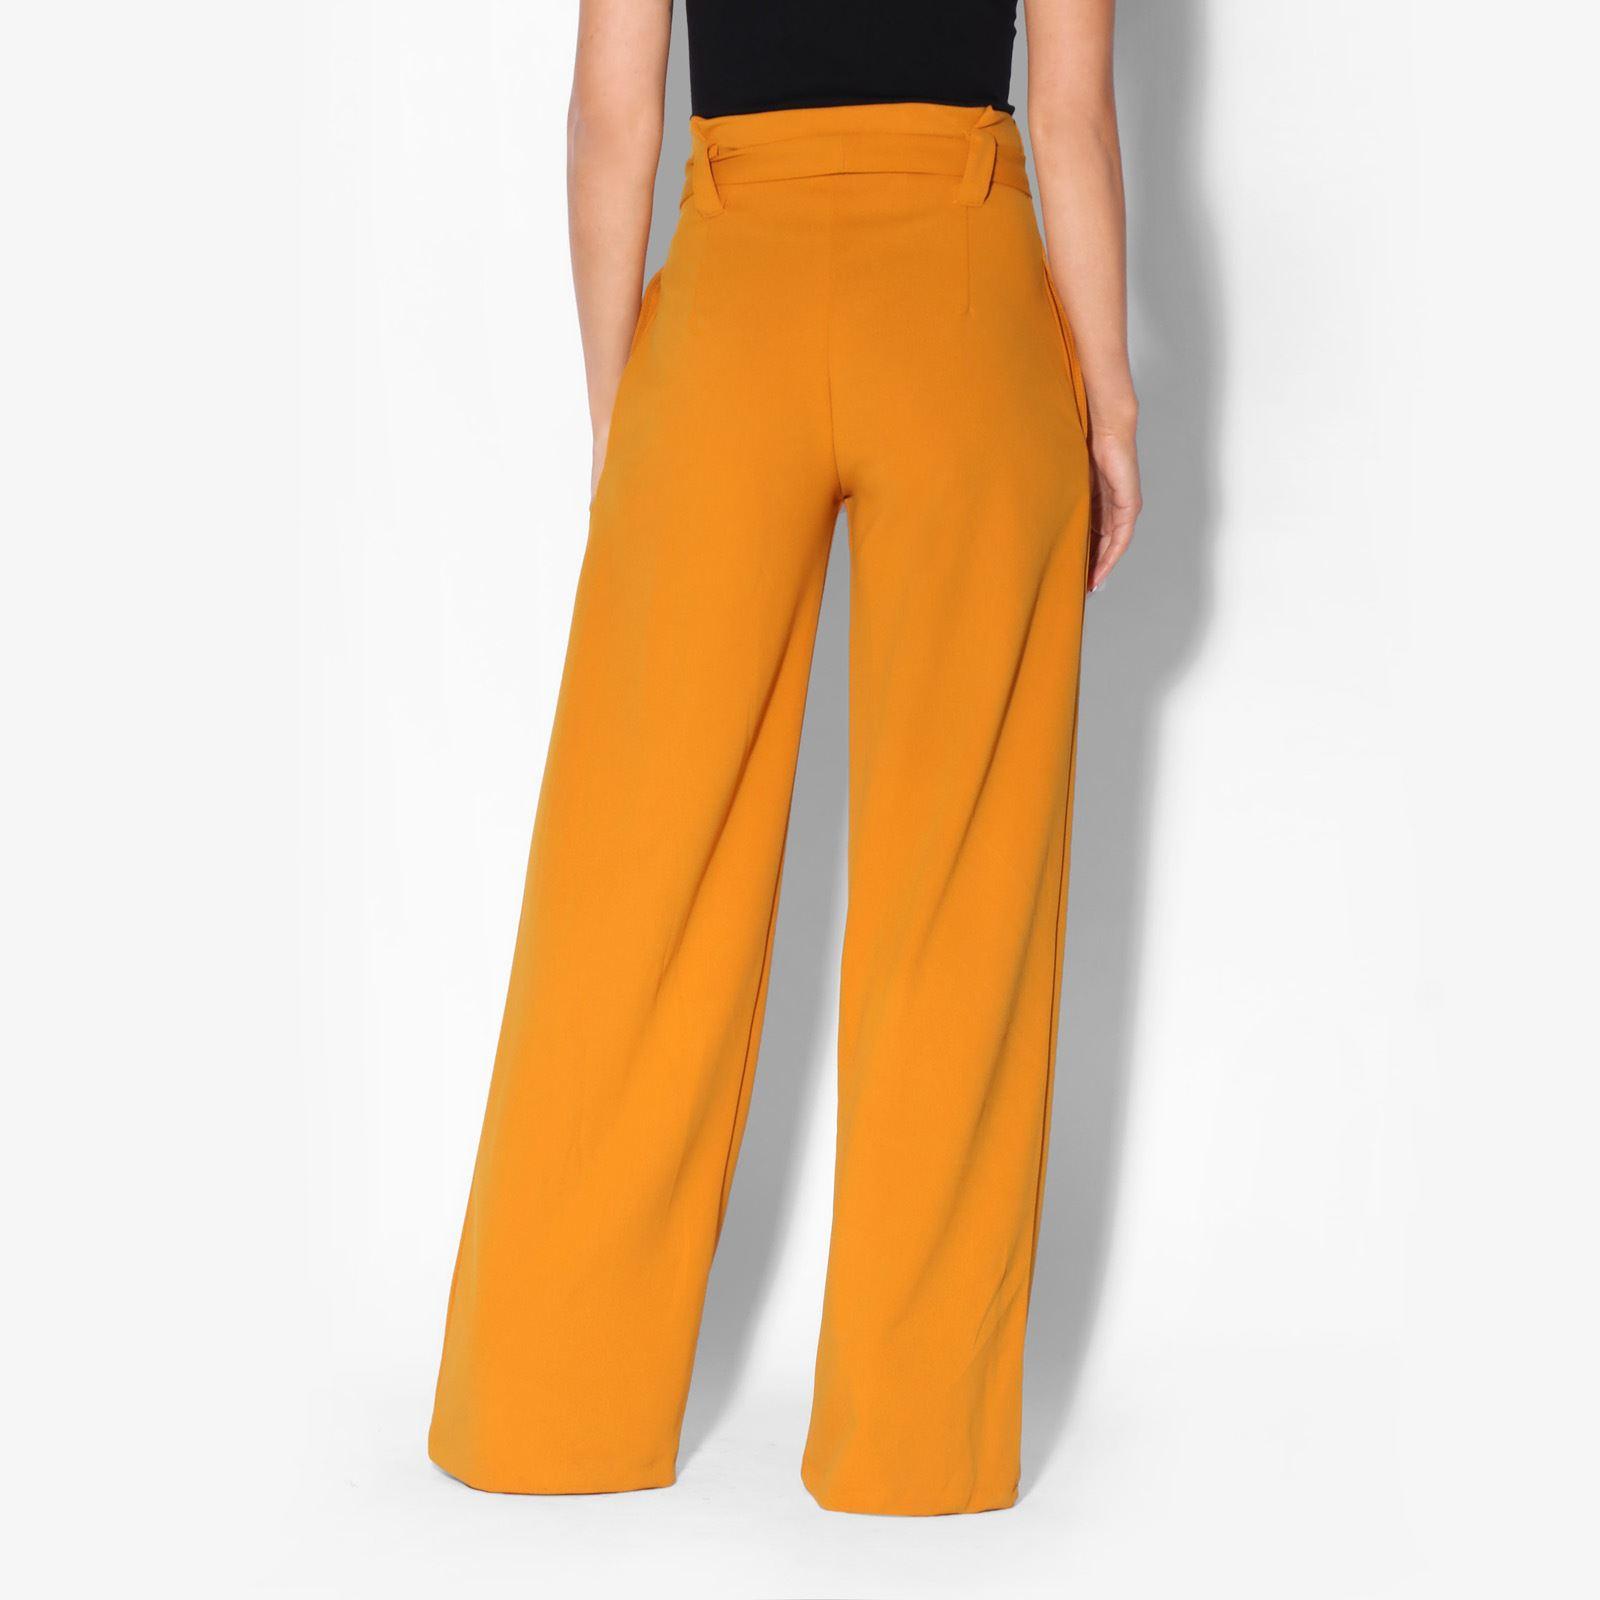 Womens-Ladies-High-Waist-Wide-Leg-Trousers-Paper-Bag-Flared-Leg-Palazzo-Pants thumbnail 5